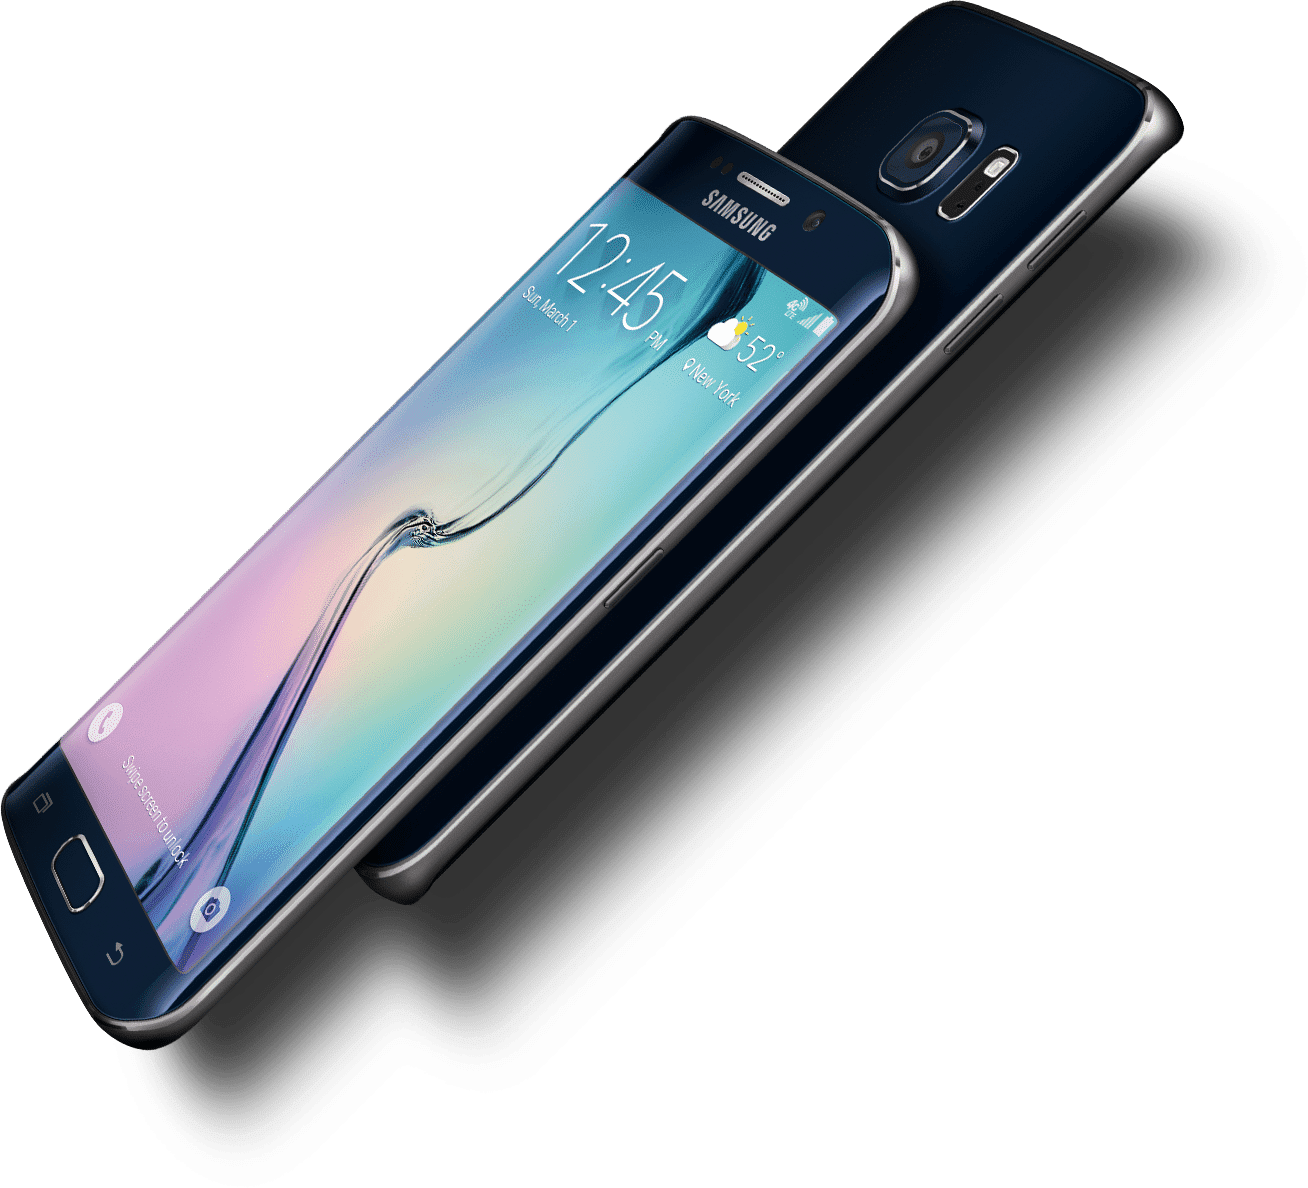 Samsung Galaxy Edge 6 Pre order